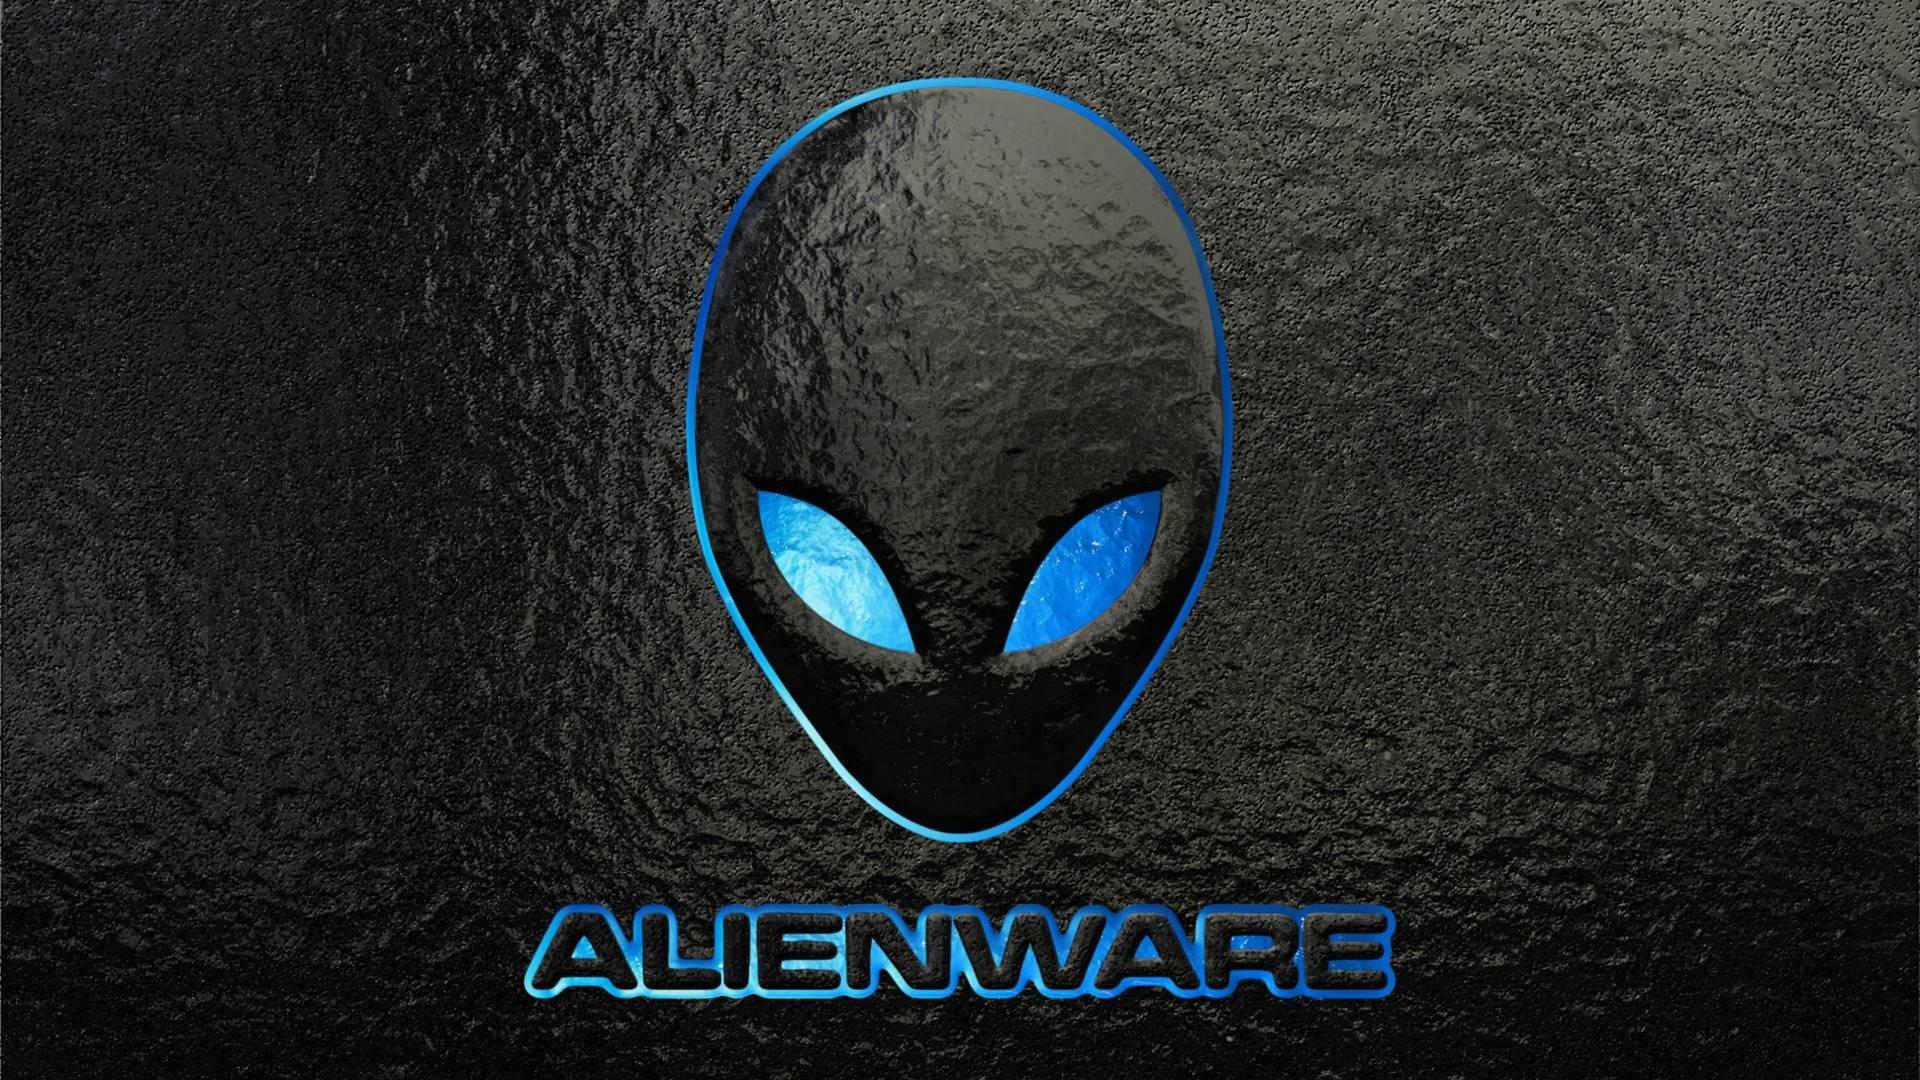 Dell Alienware Wallpaper High Definition